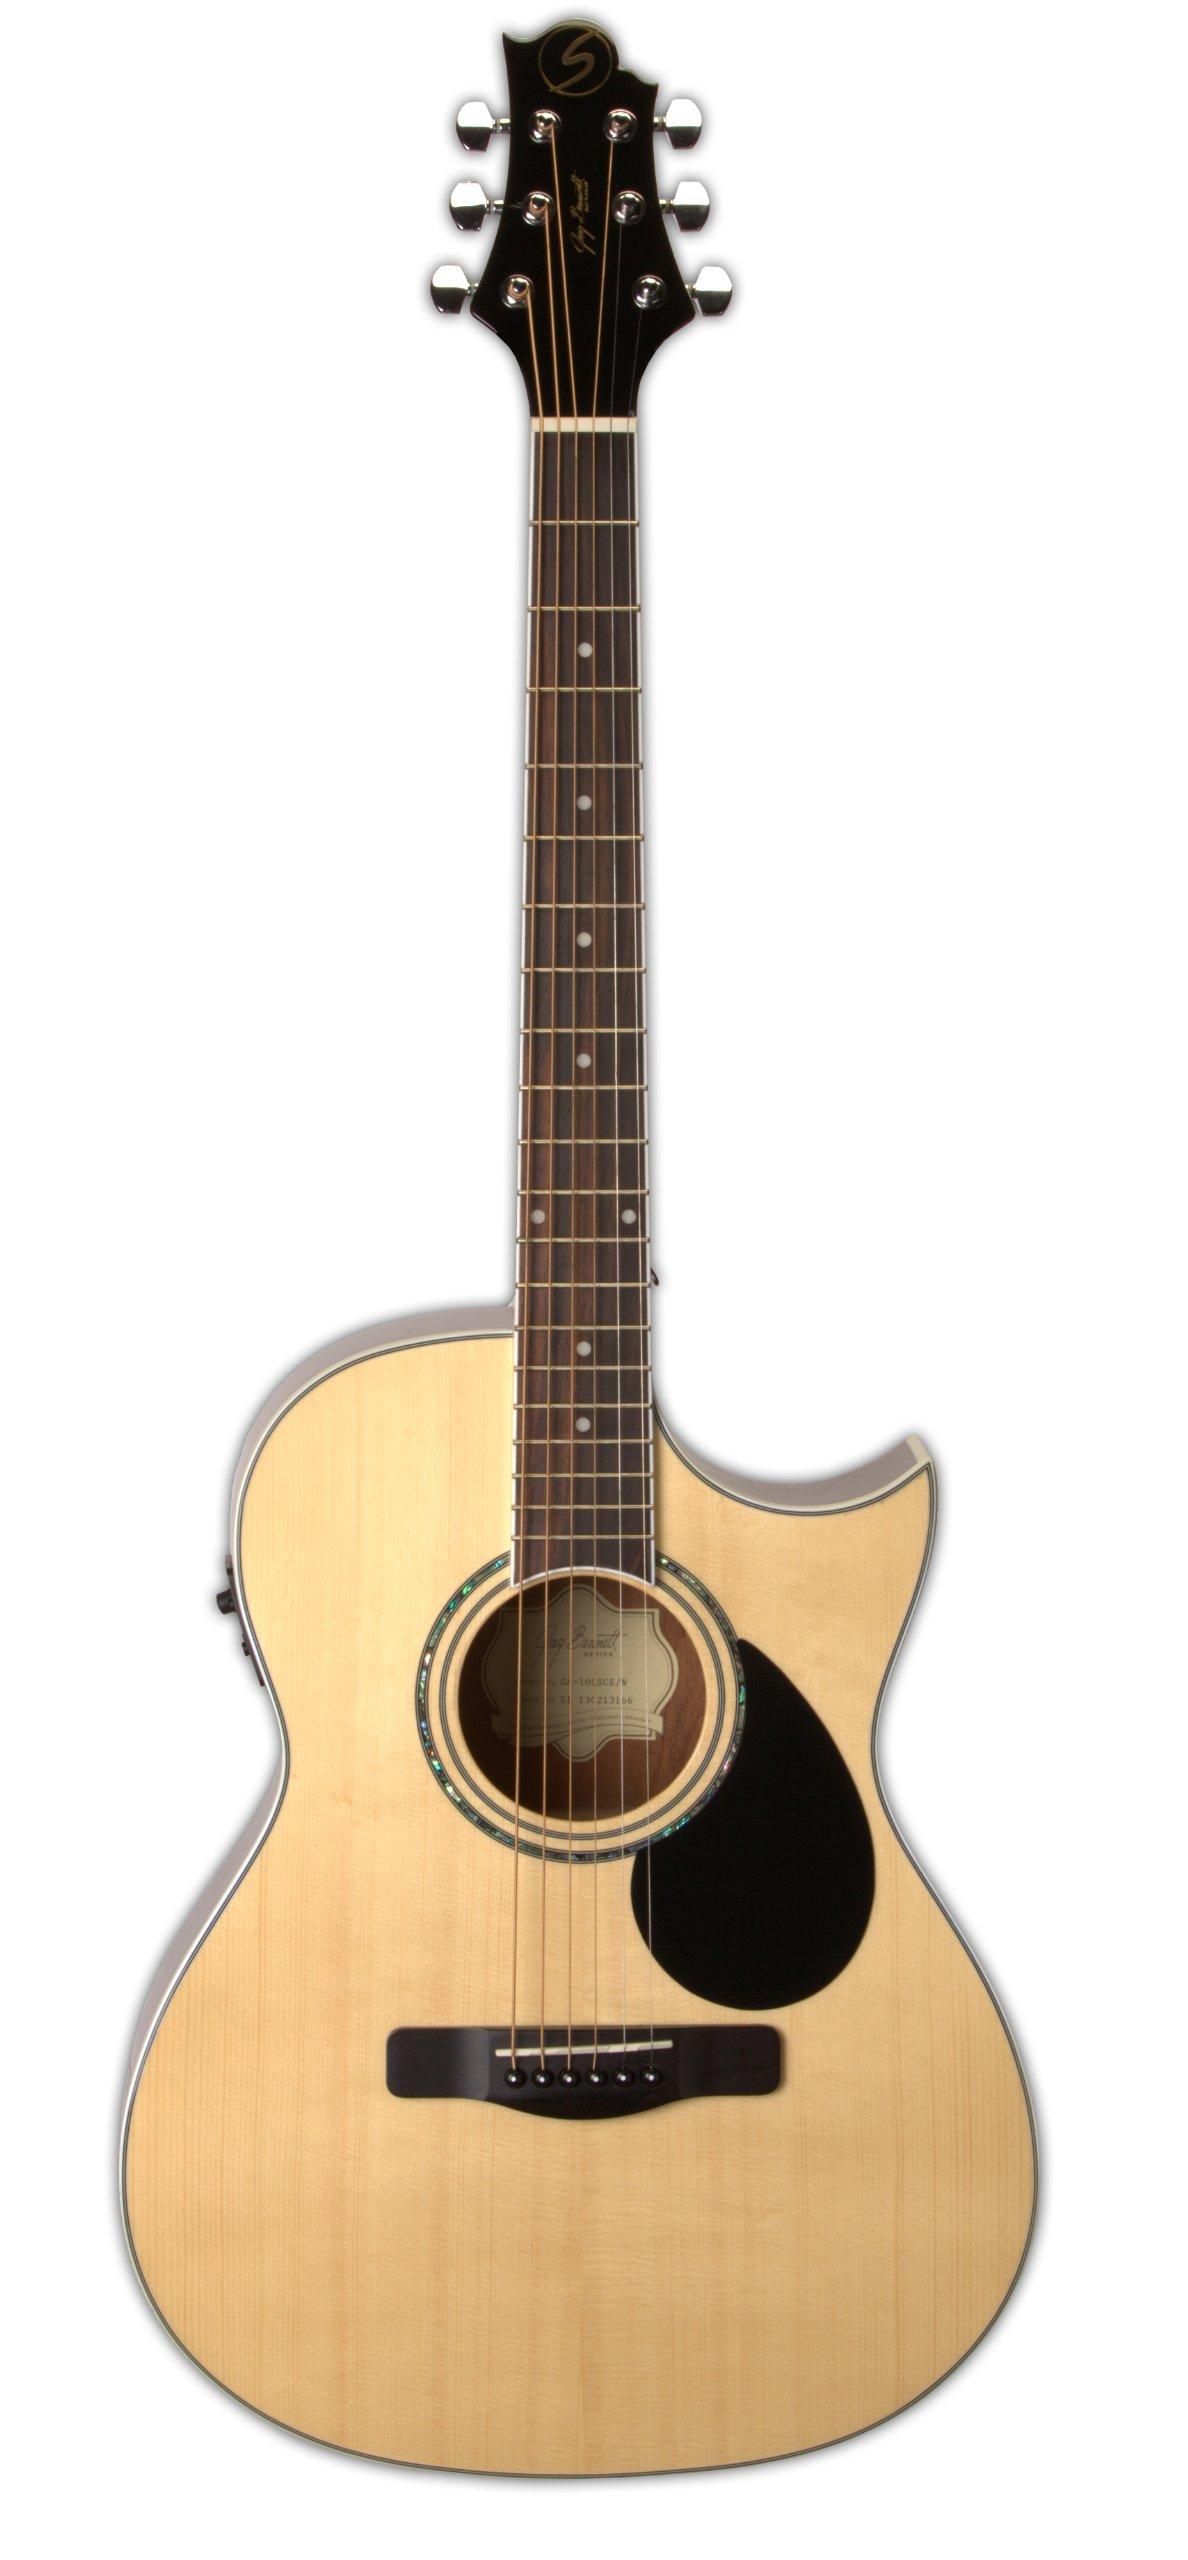 Greg Bennett Design G Series 100 GA100SCE N Auditorium Acoustic-Electric Guitar, Natural by Greg Bennett Design